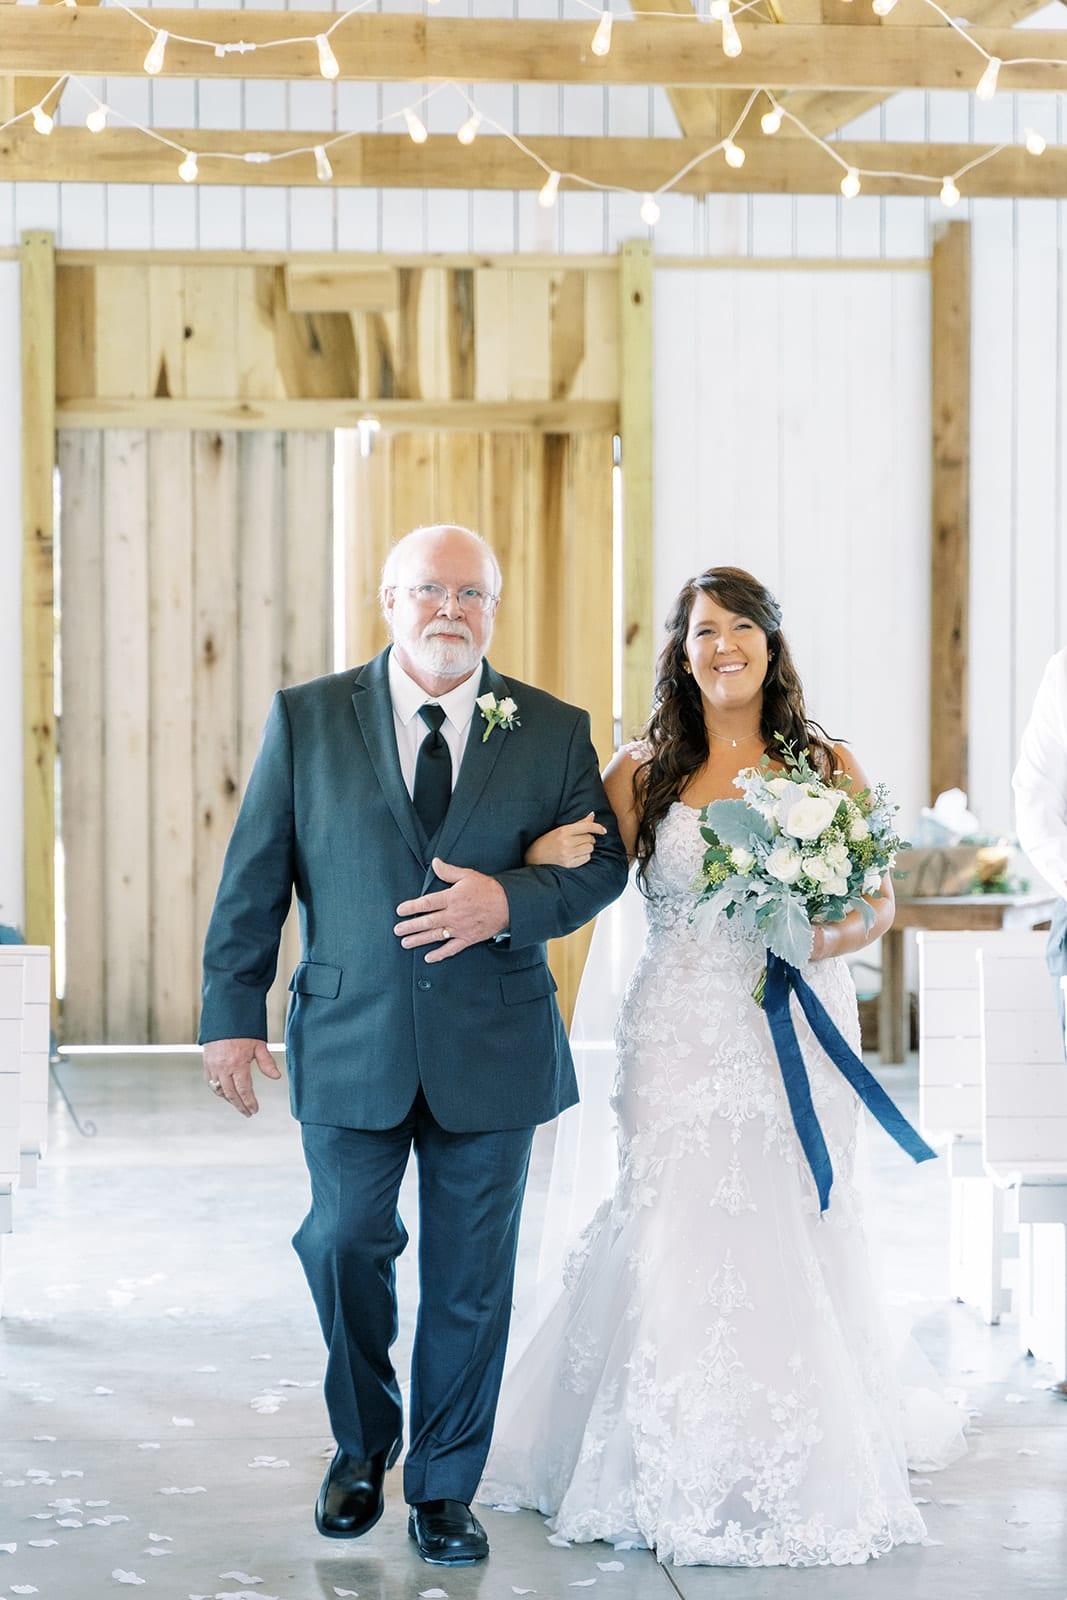 Father escorting bride down the aisle at Grace Valley Farm | Nashville Bride Guide